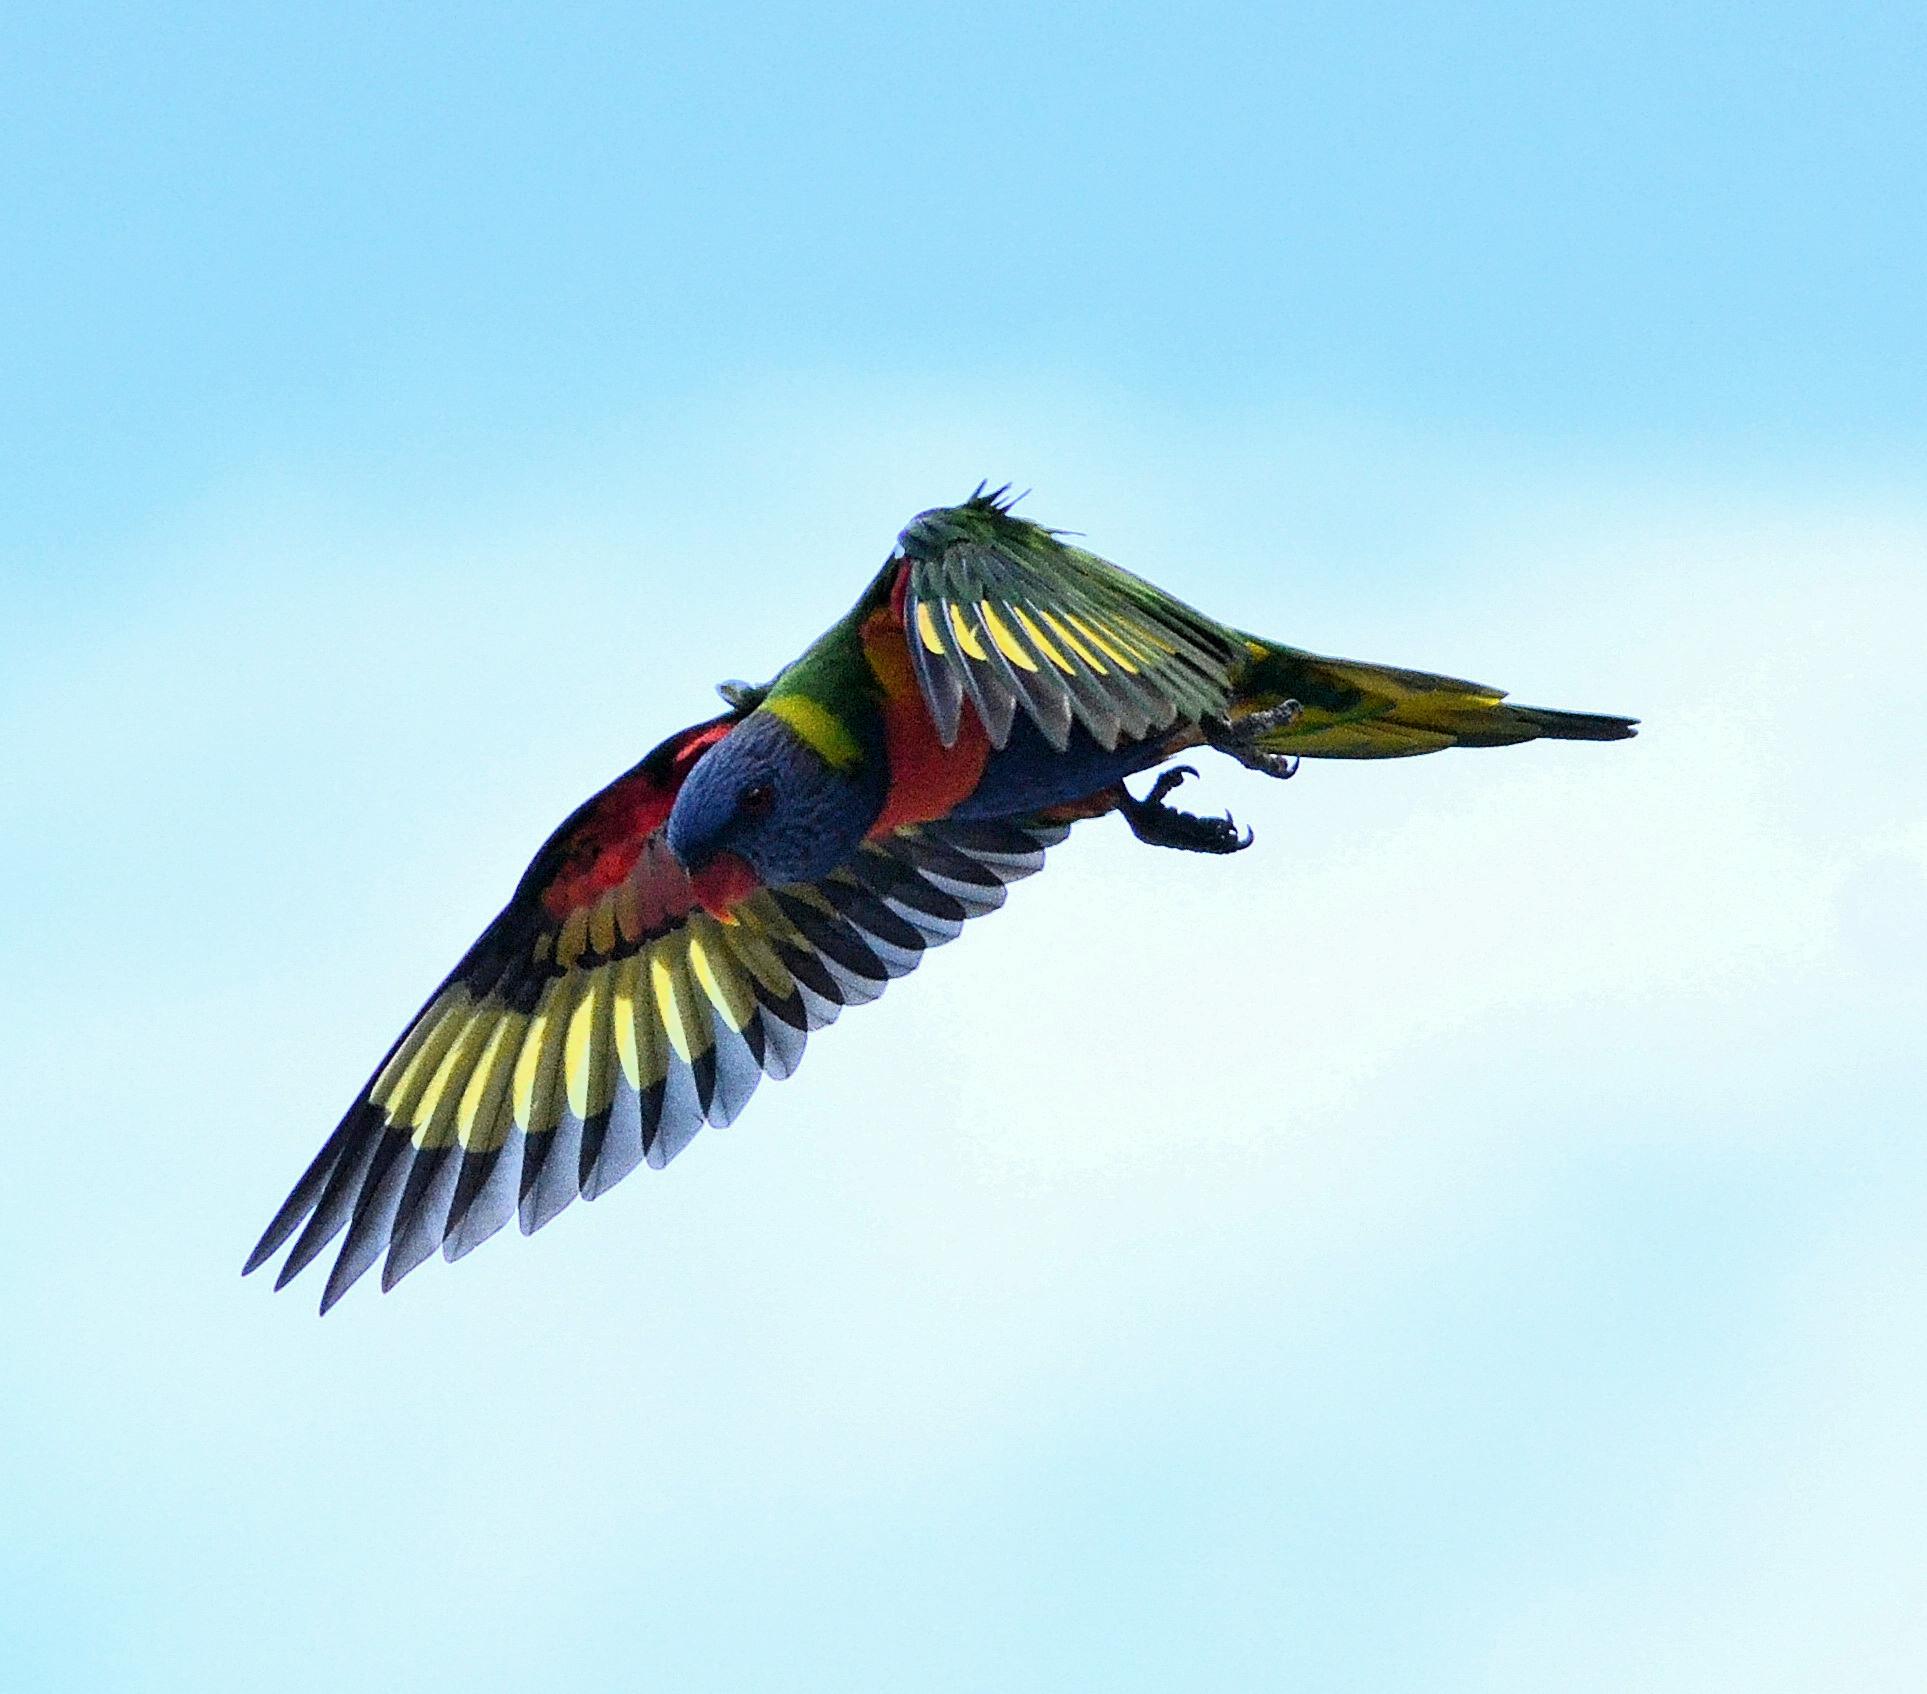 Wallpaper Burung Burung Alam Burung Beo Langit Bulu Penerbangan Margasatwa Paruh Queensland Penerbangan Pelangi Macaw Sayap Fauna Flickrdiamond Lorikeet Coraciiformes Coochiemudlo 1927x1694 881132 Hd Wallpapers Wallhere